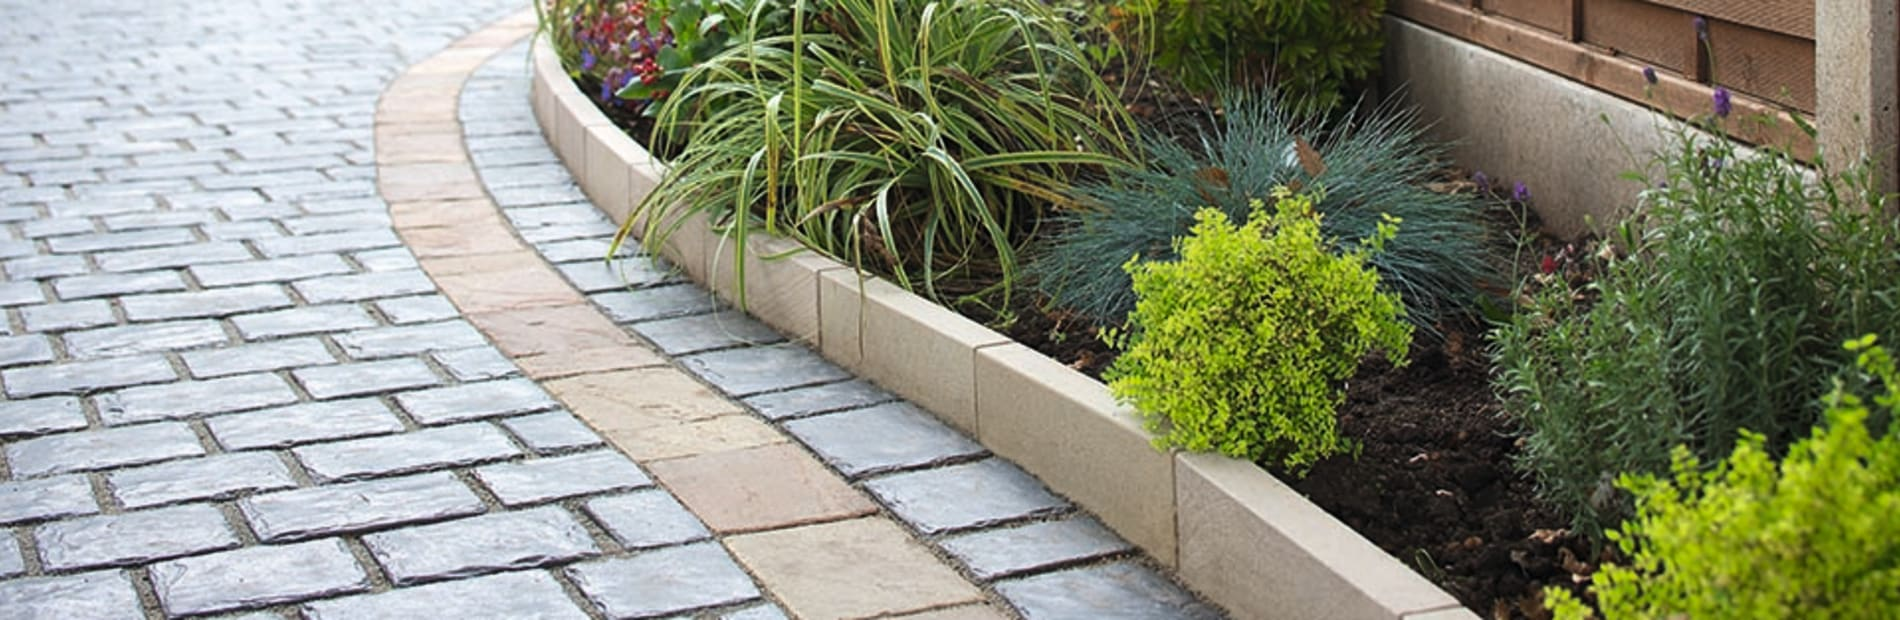 Garden border edging ideas | Marshalls